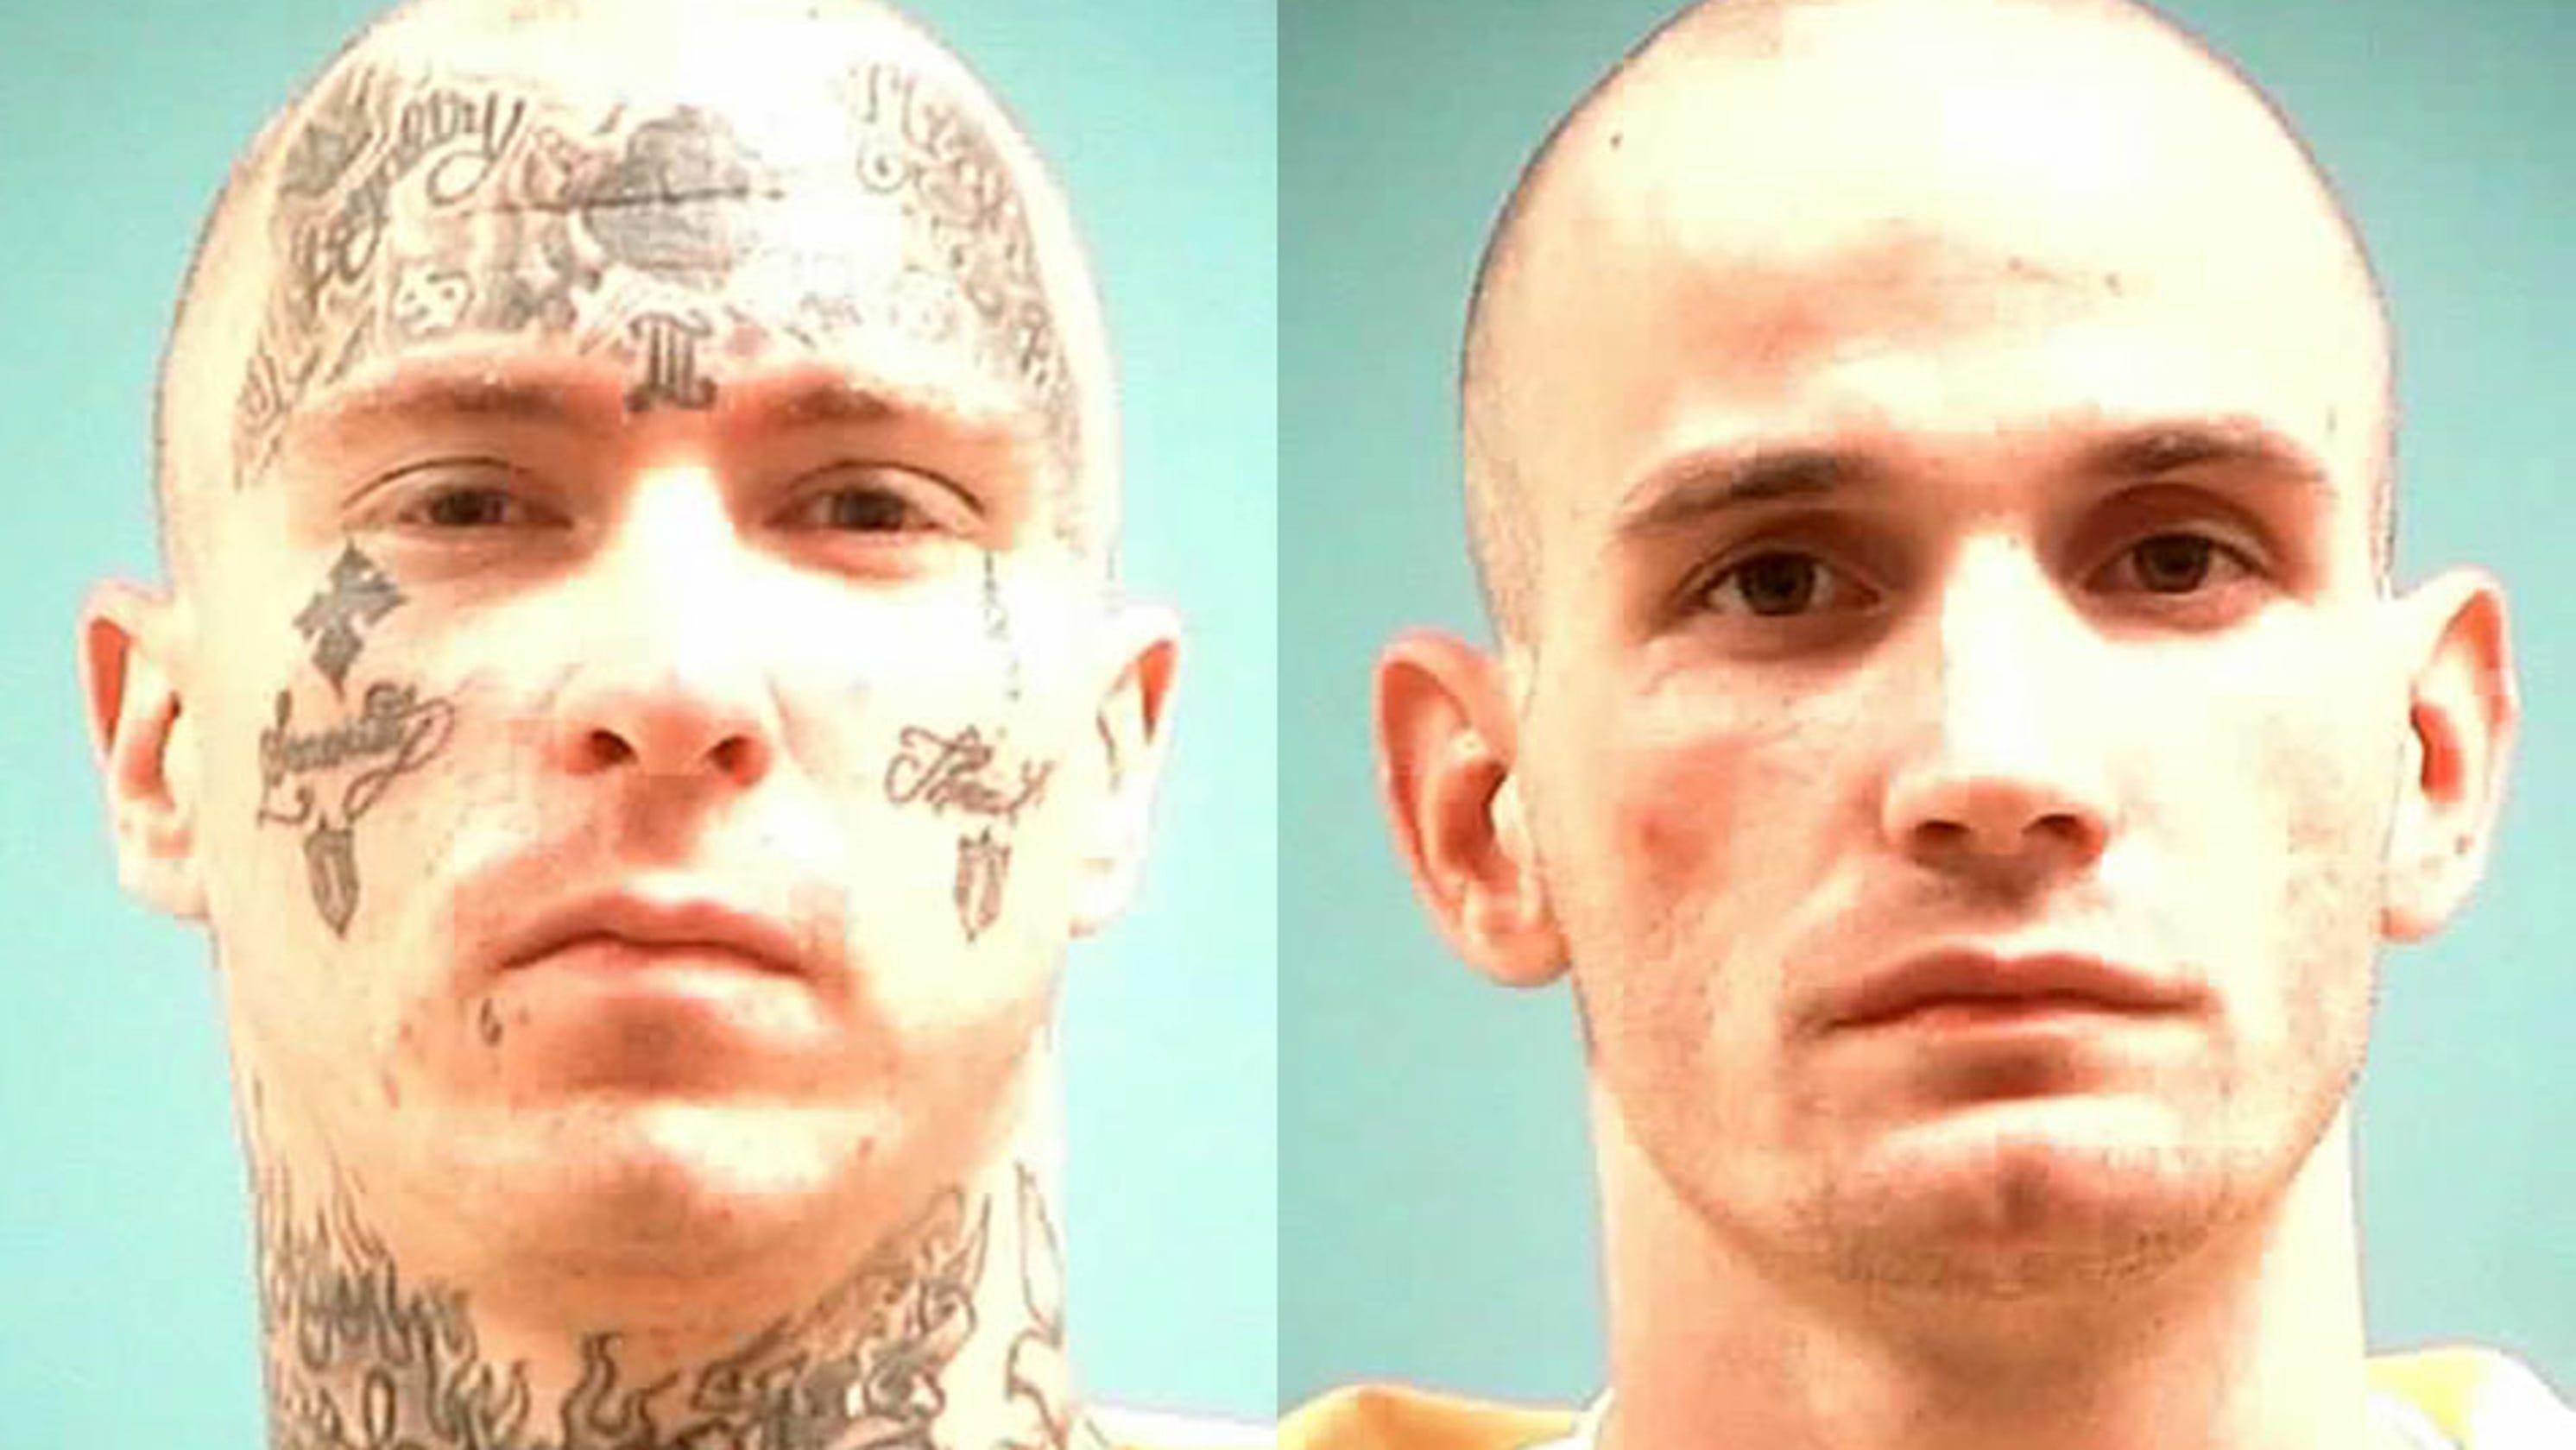 2 escaped prison inmates focus of manhunt in Rankin County